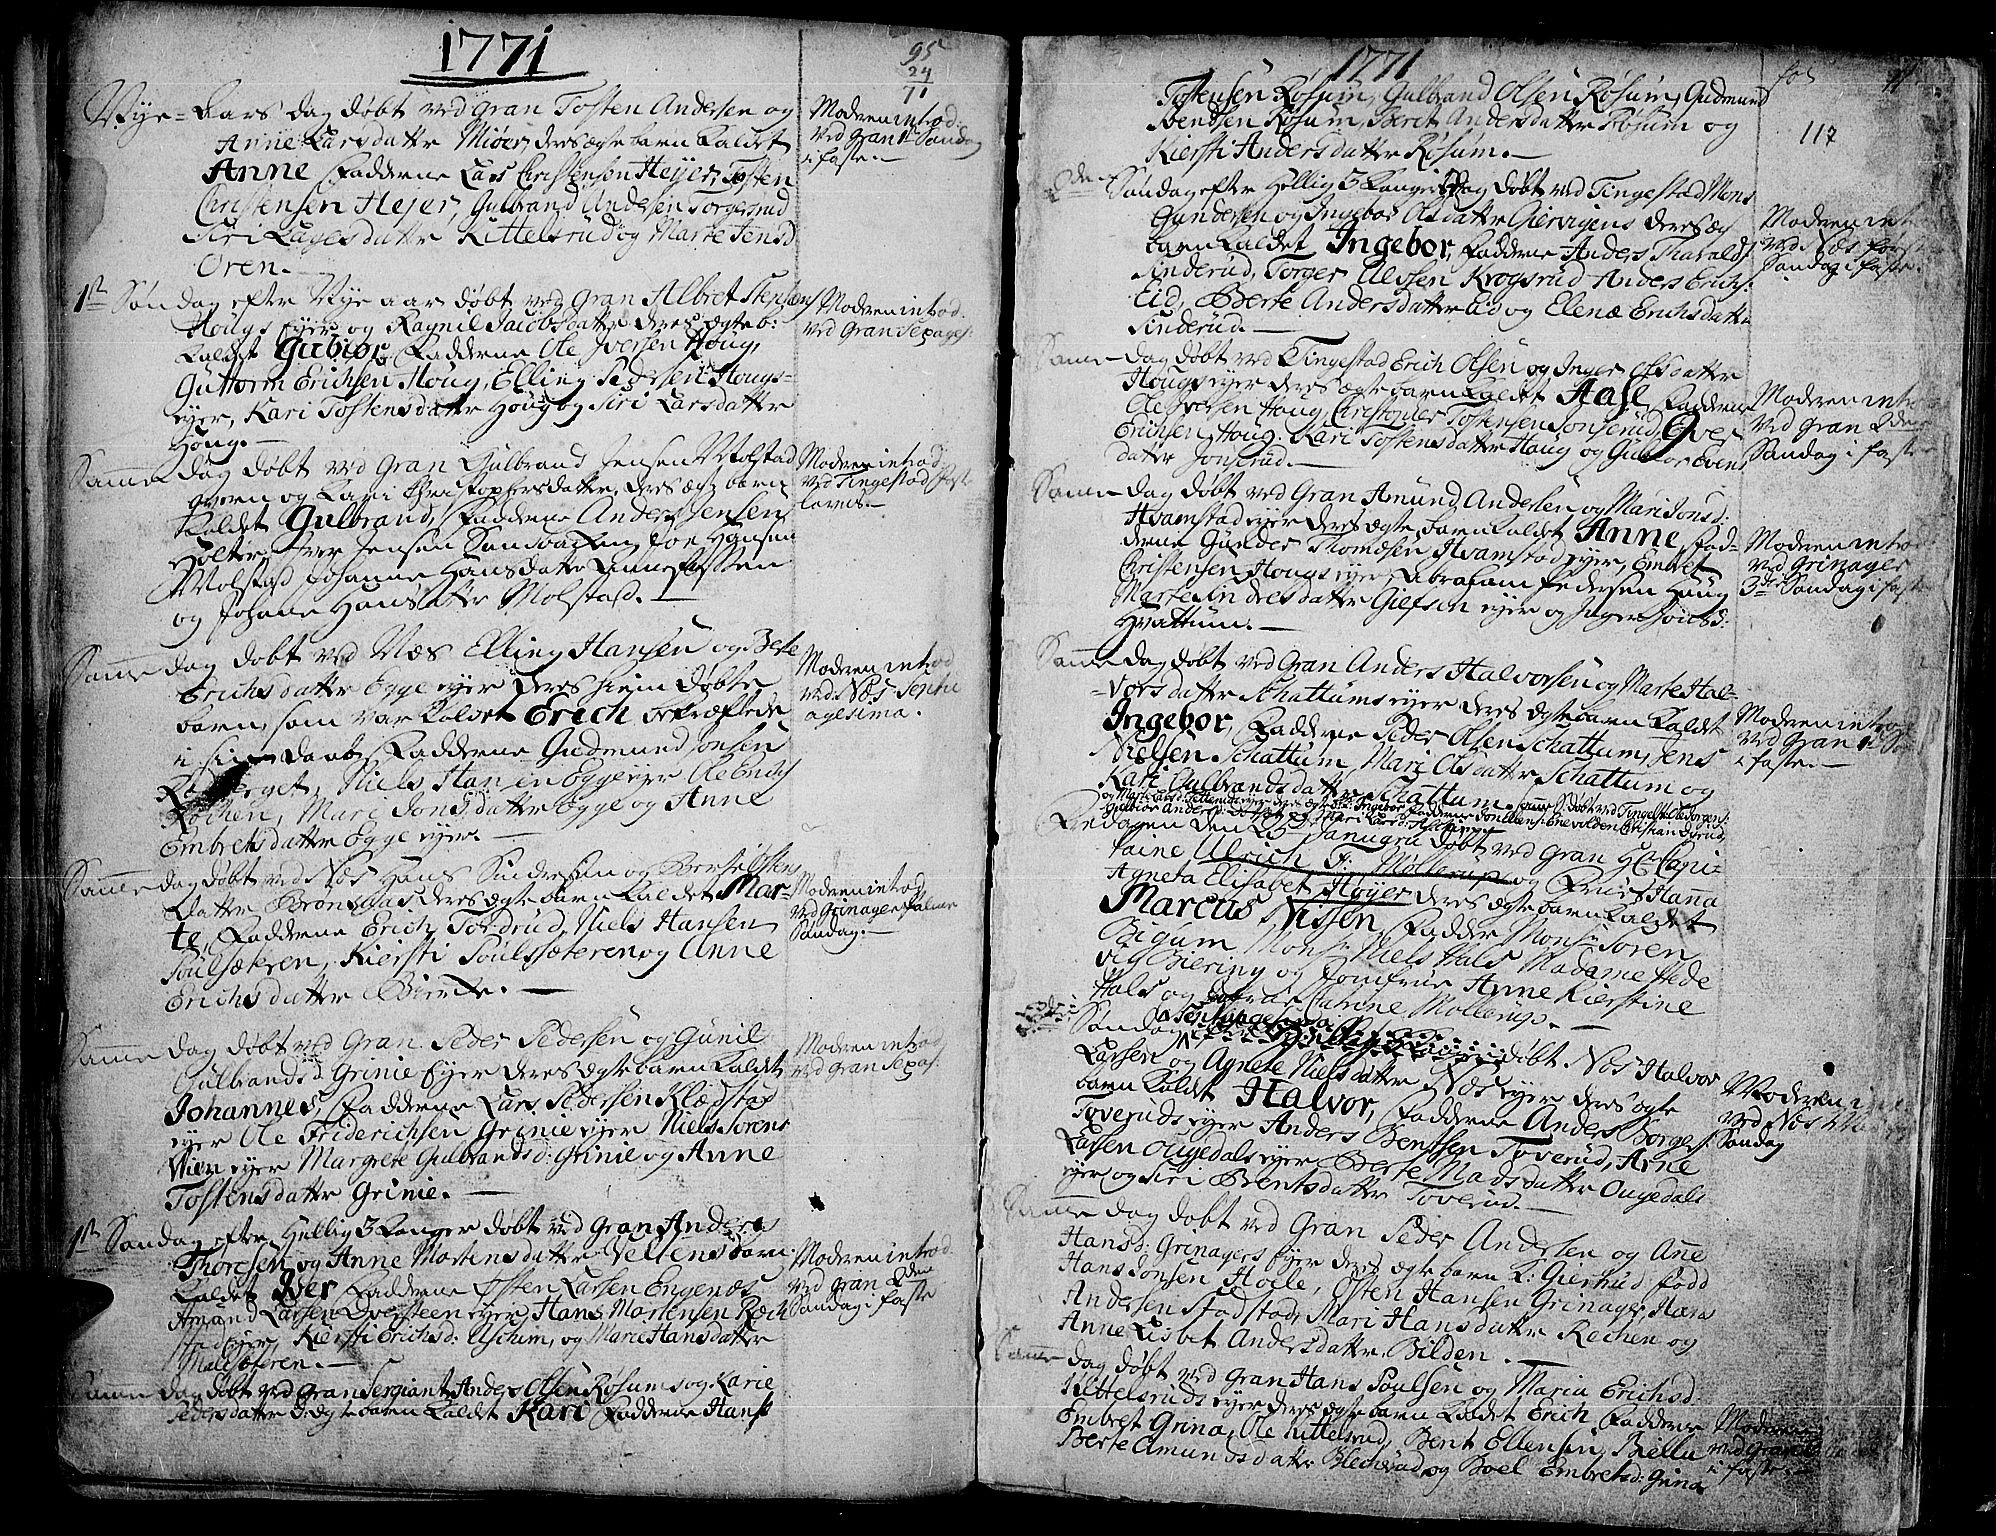 SAH, Gran prestekontor, Ministerialbok nr. 4, 1759-1775, s. 117